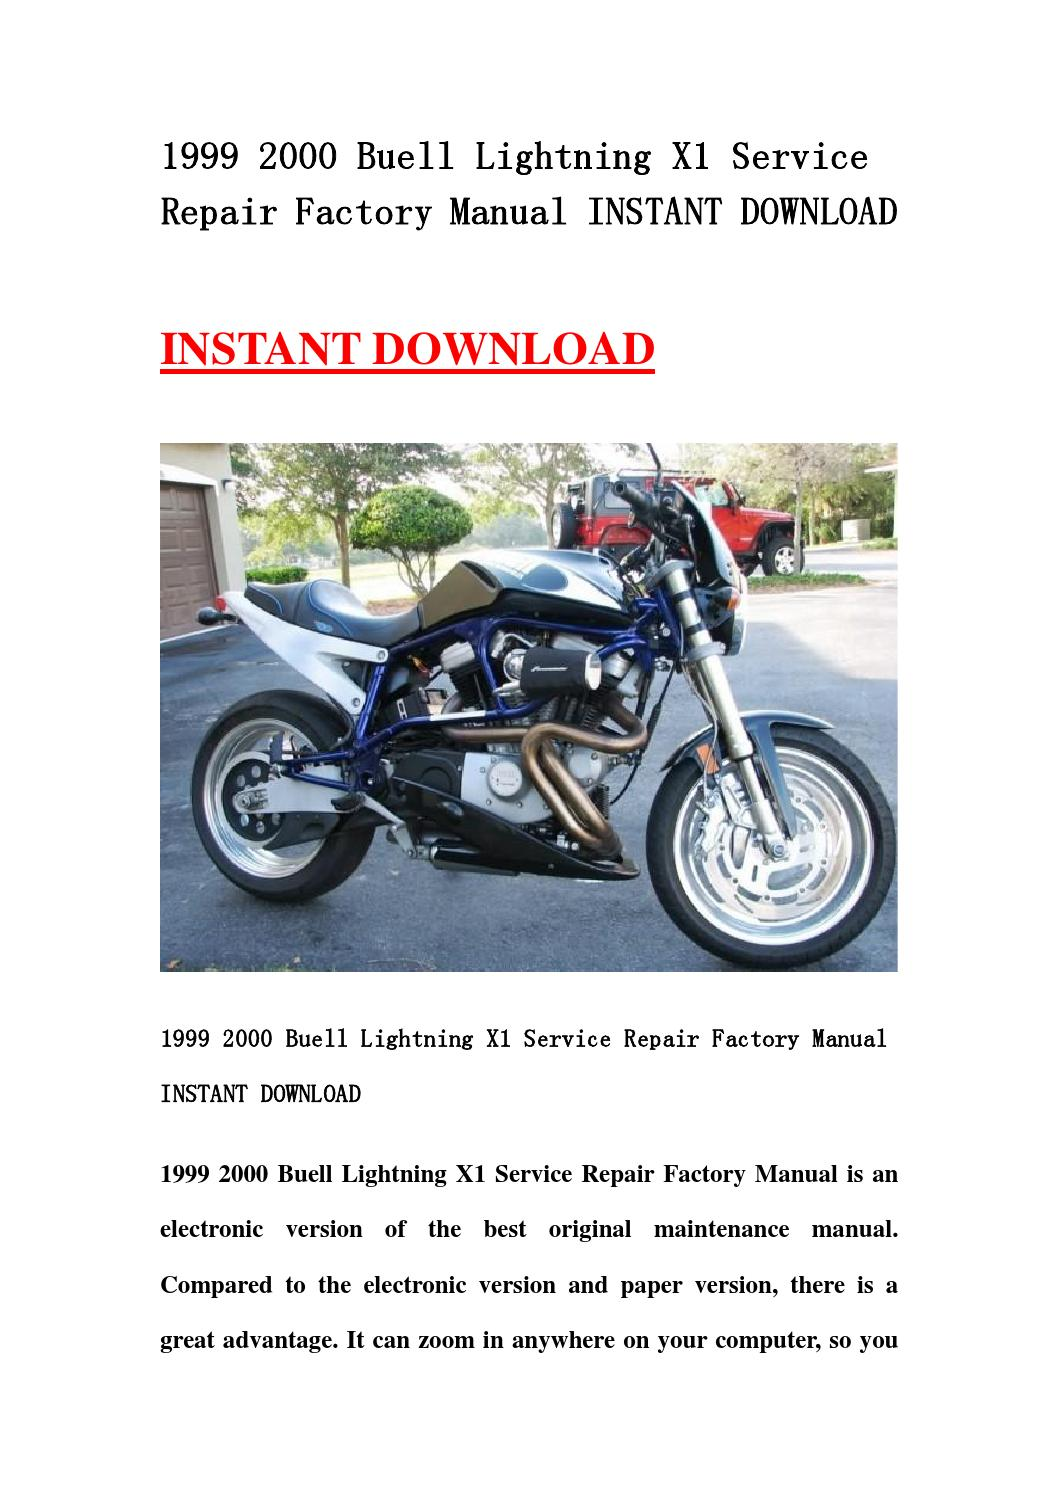 1999 2000 Buell Lightning X1 Service Repair Factory Manual border=